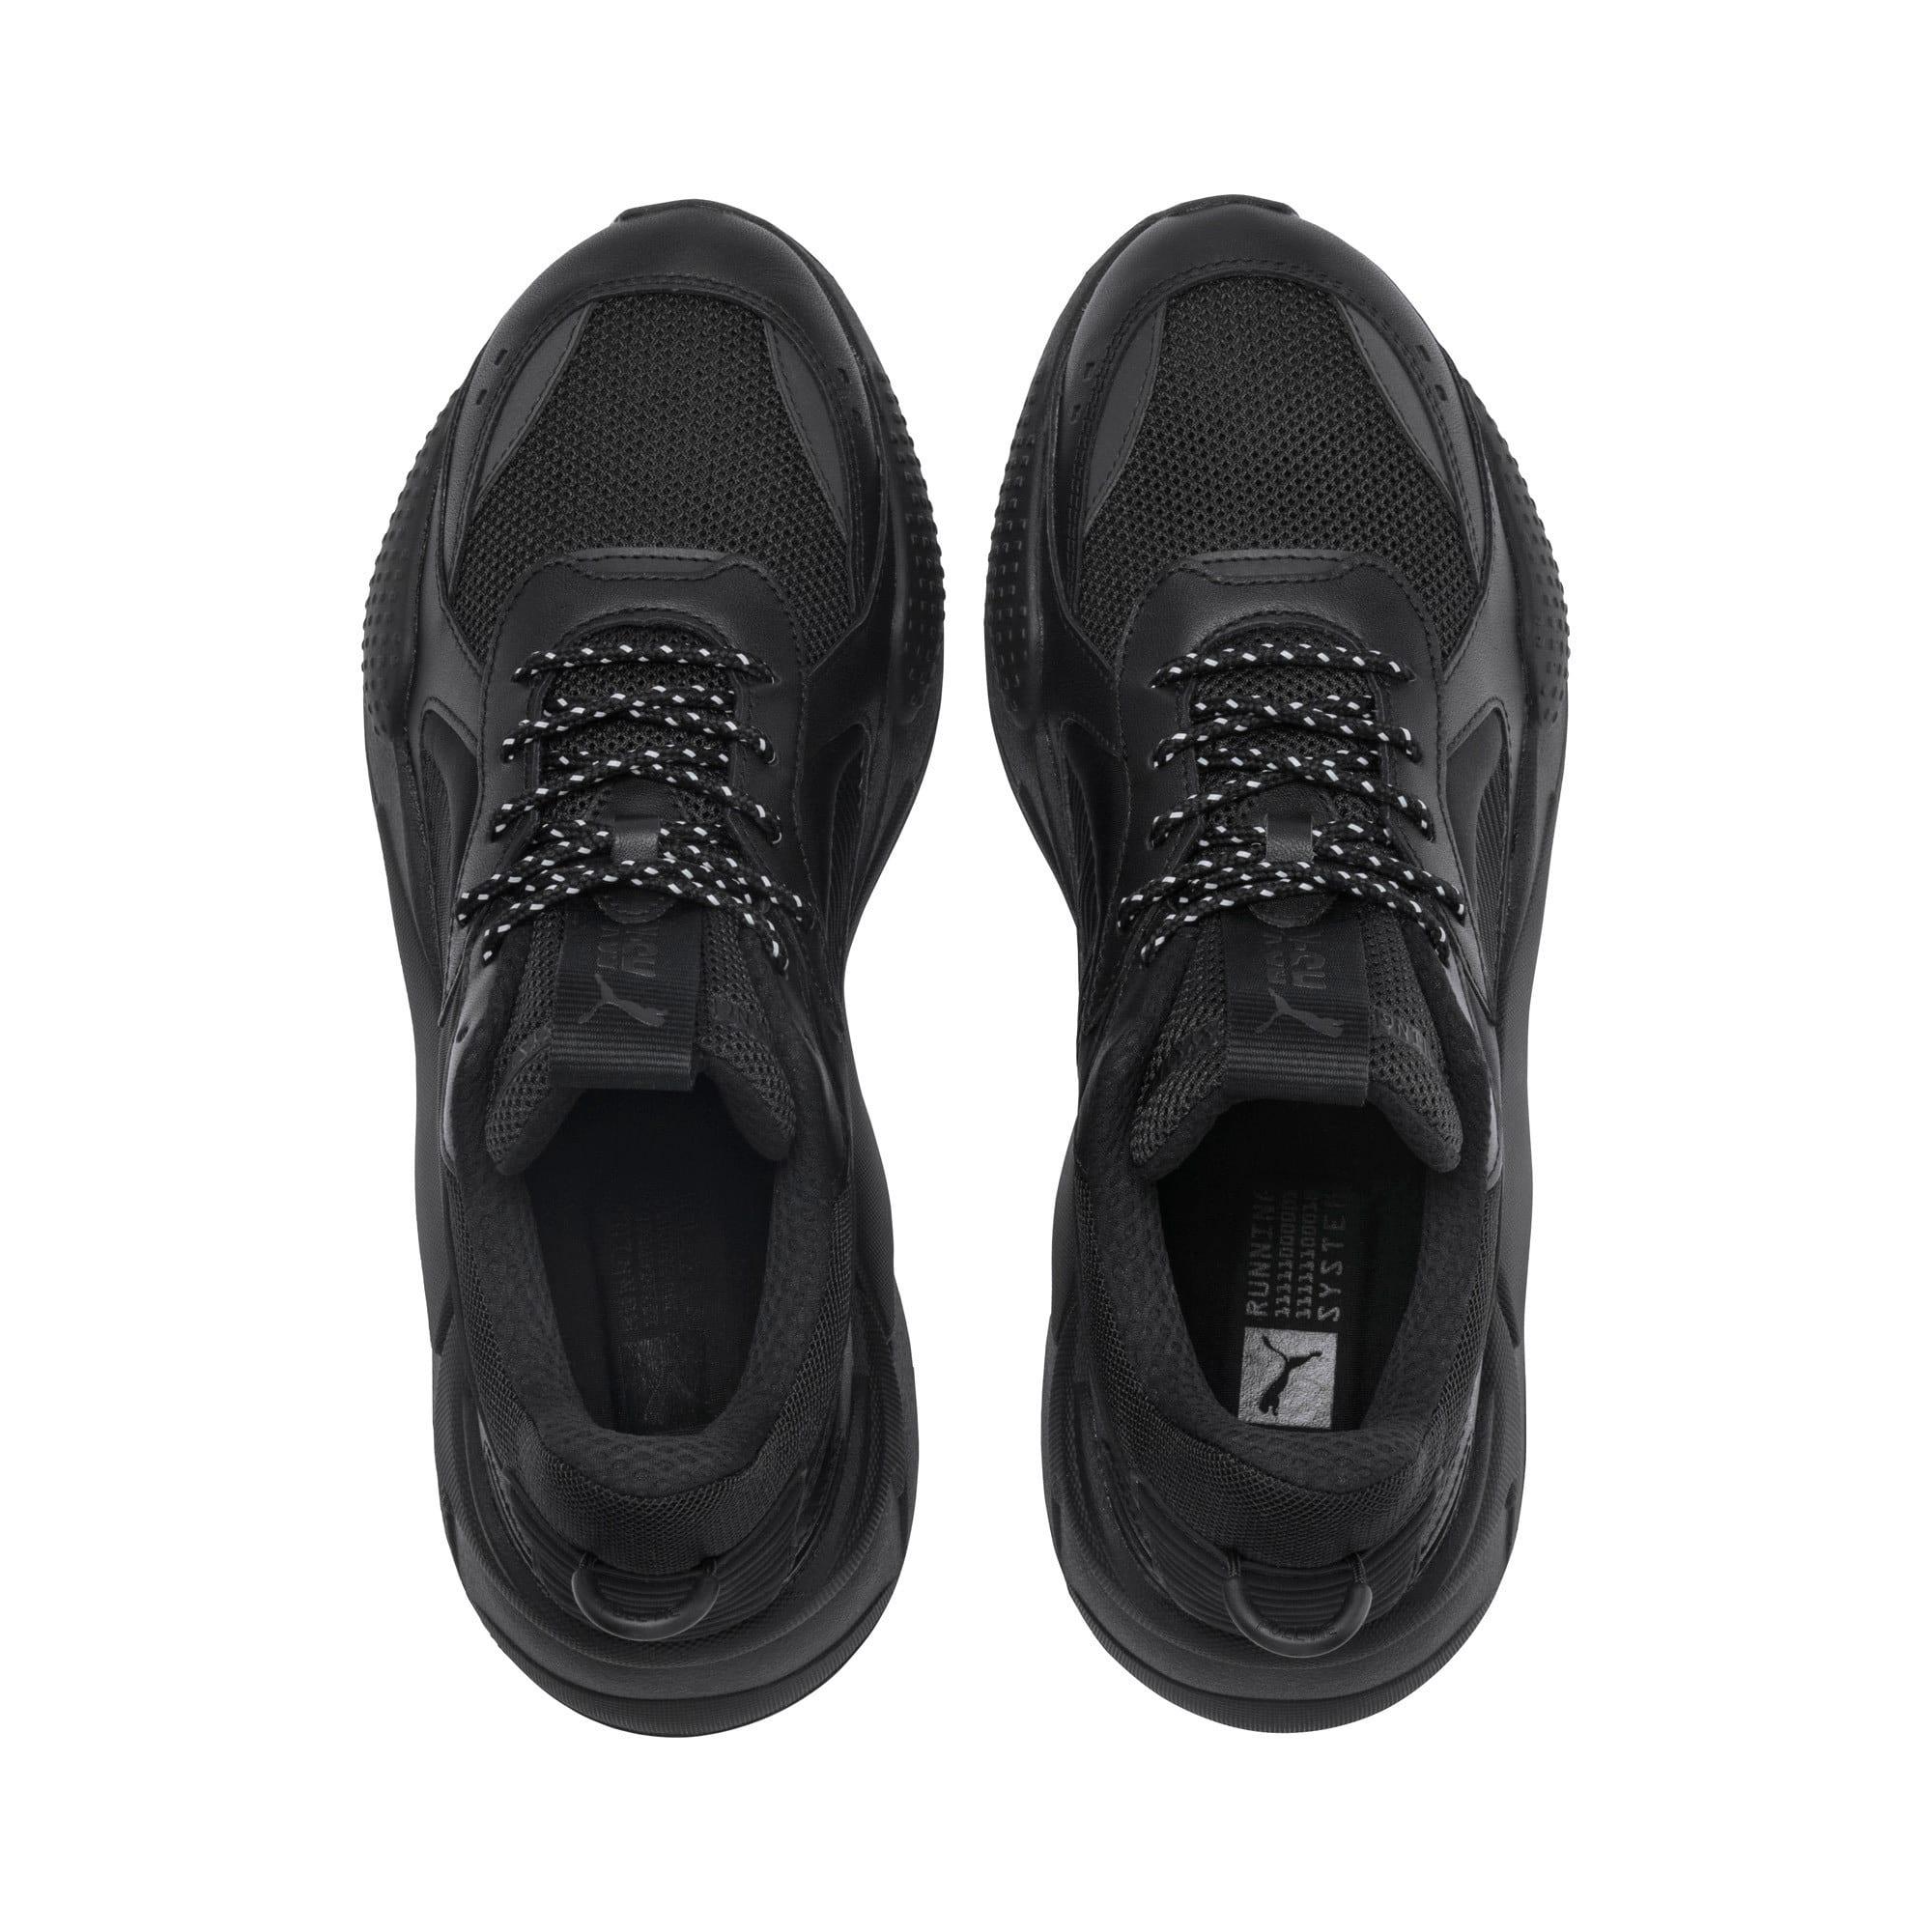 Thumbnail 6 of RS-X Sneaker, Puma Black-Puma Black, medium